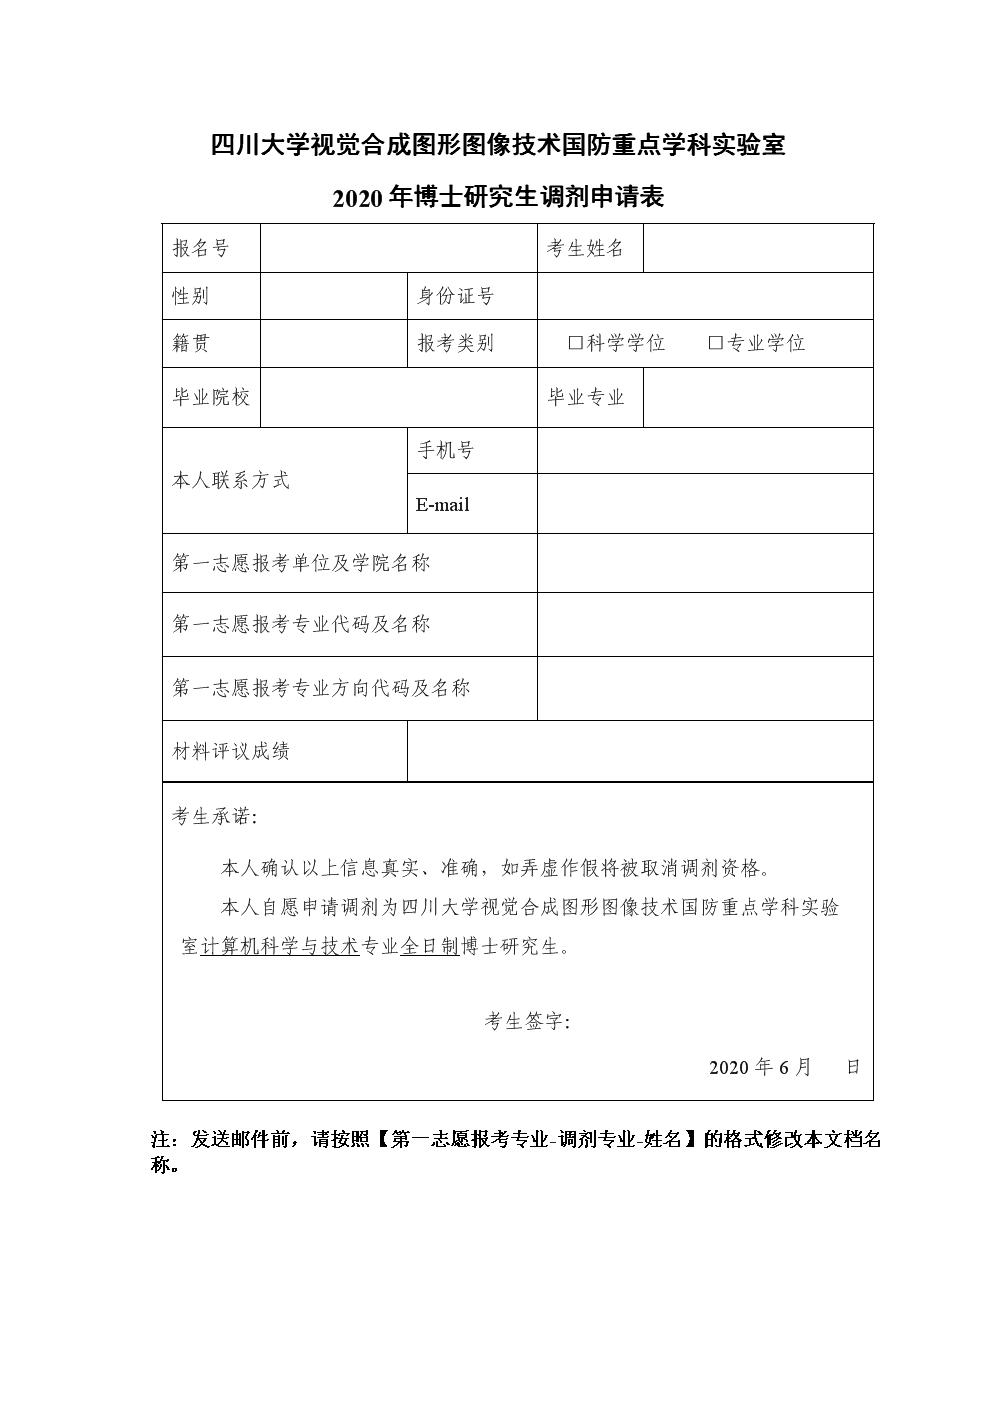 xxxx年碩士研究生調劑申請表模板.doc